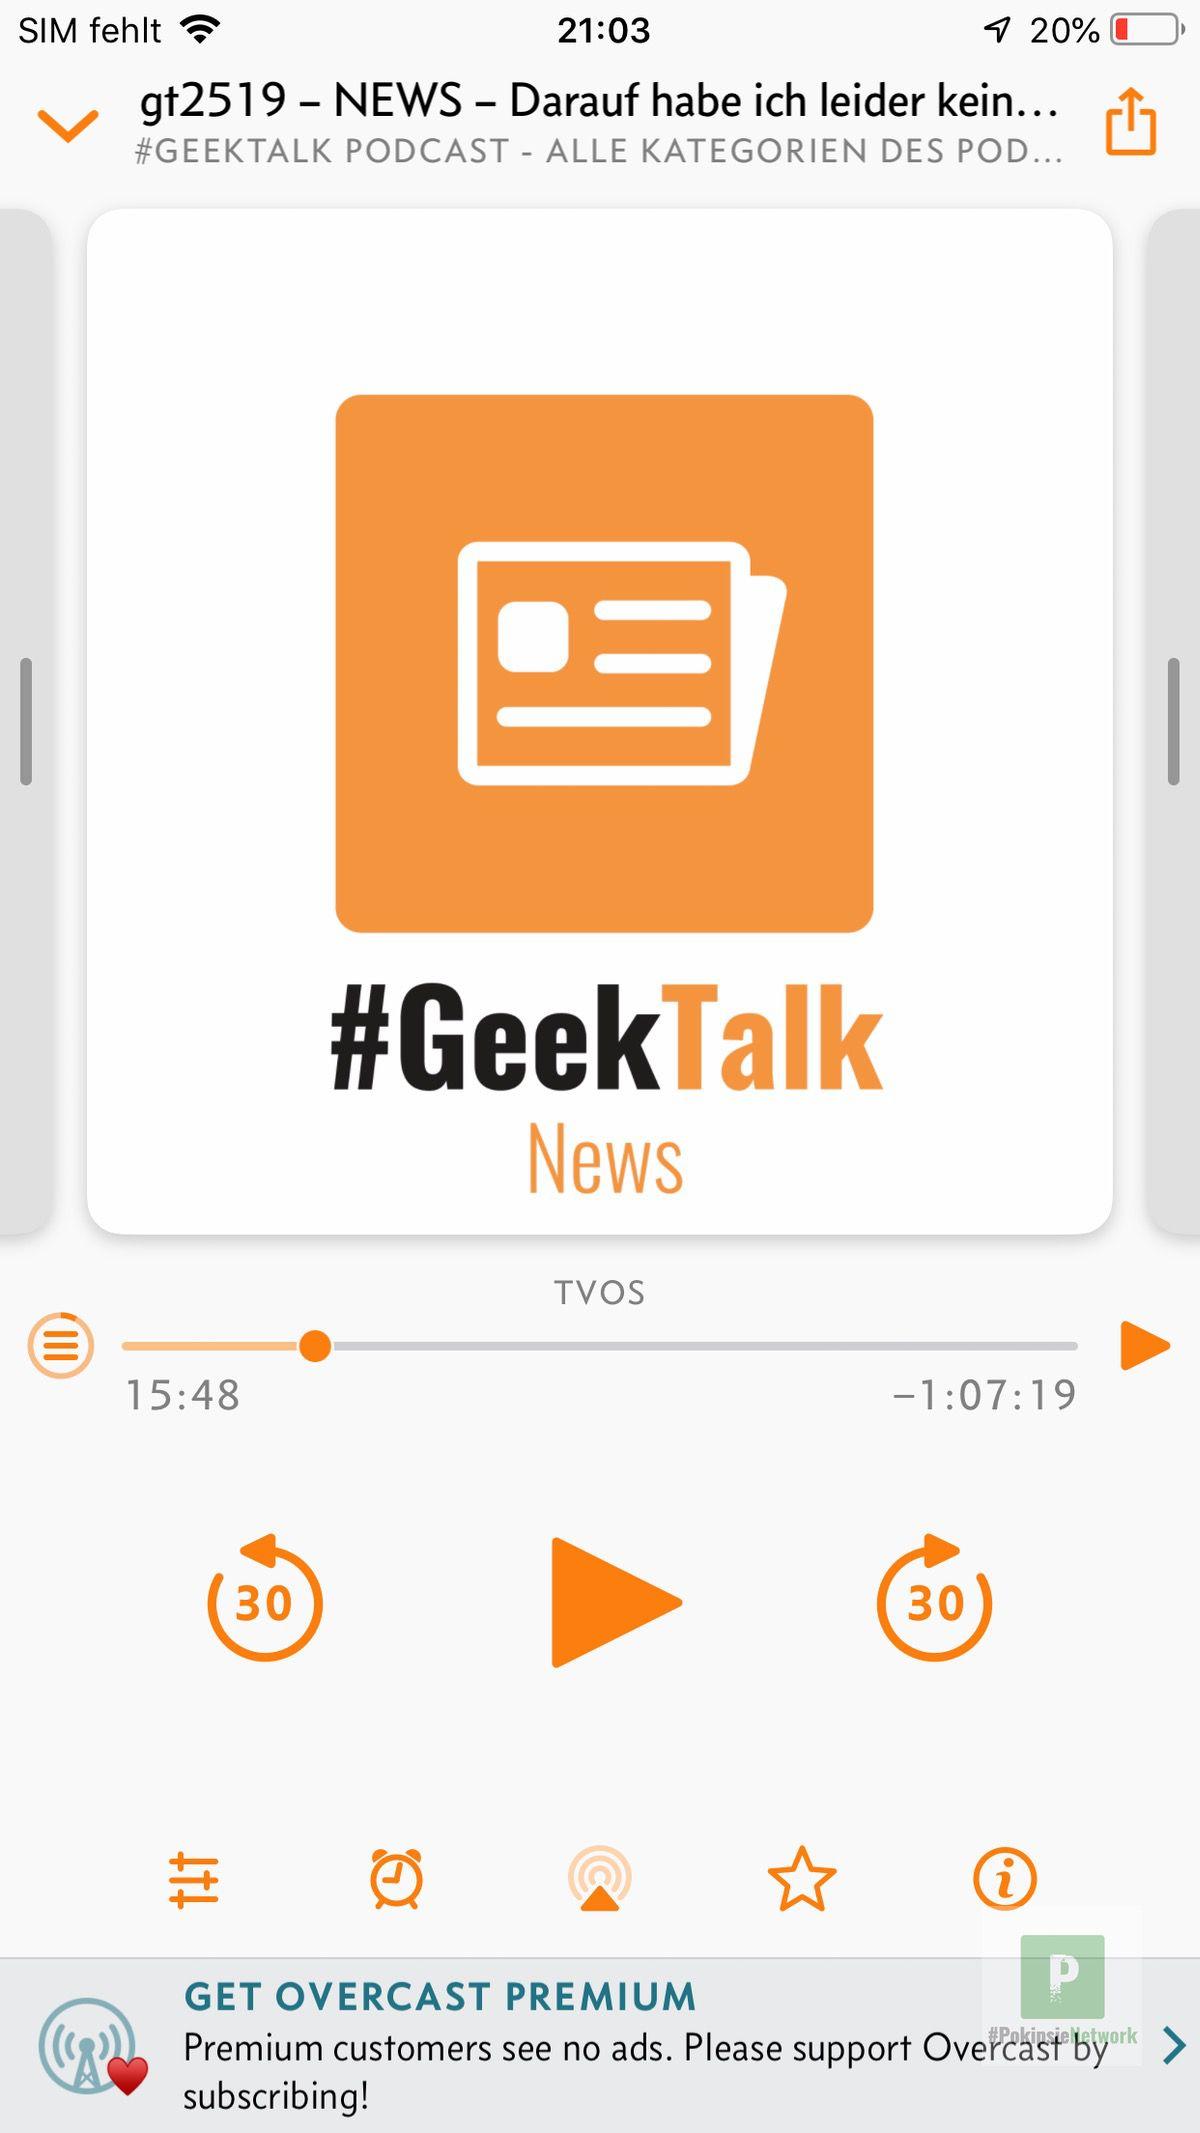 Podcast Ausschnitte teilen